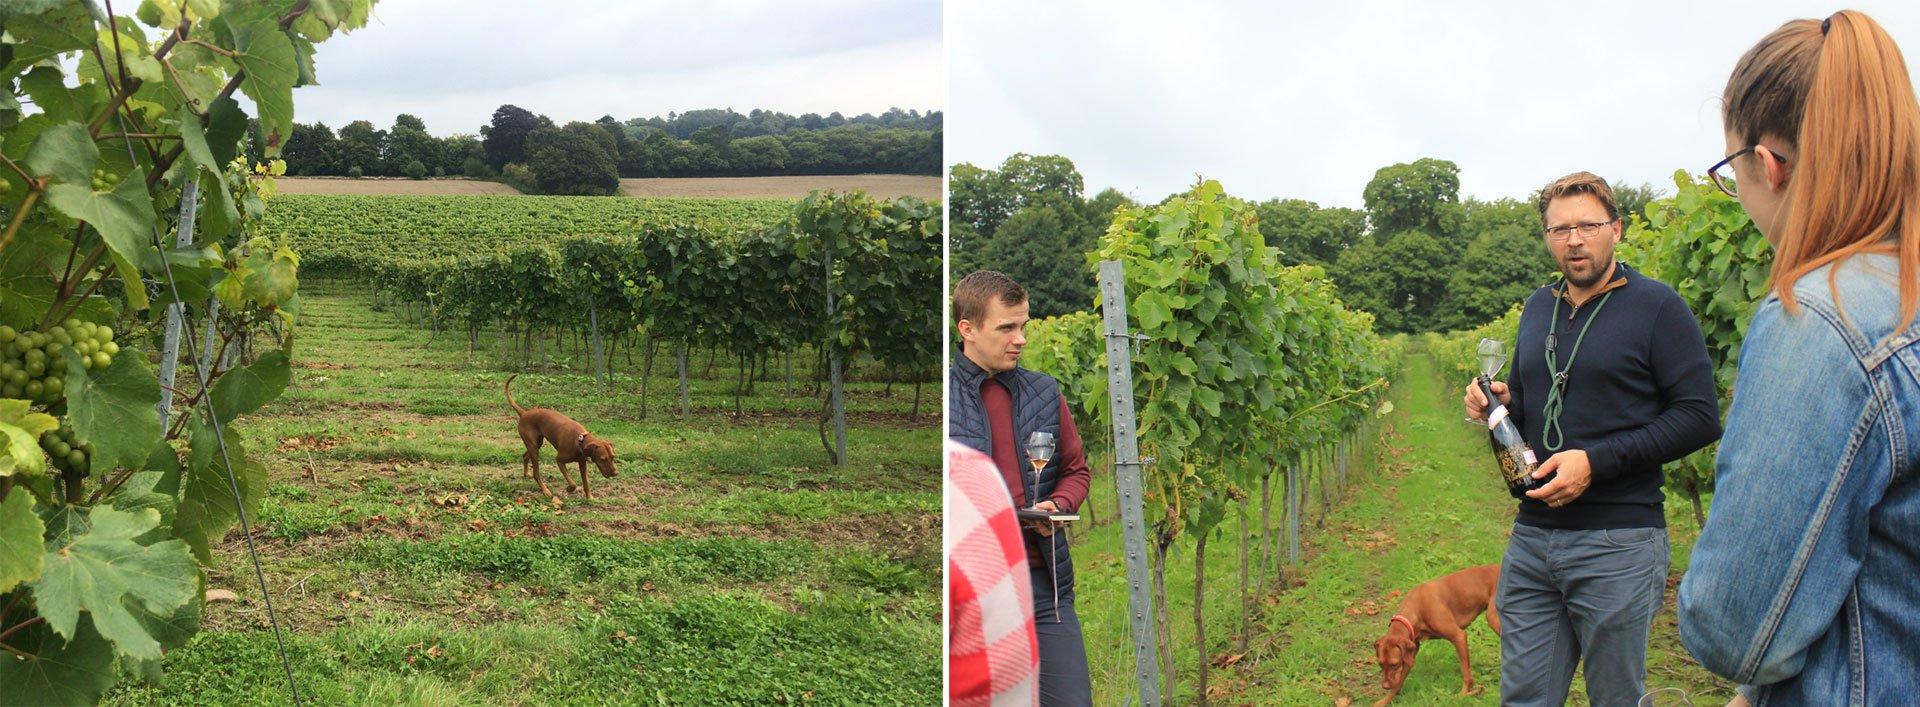 Mountfield vineyards